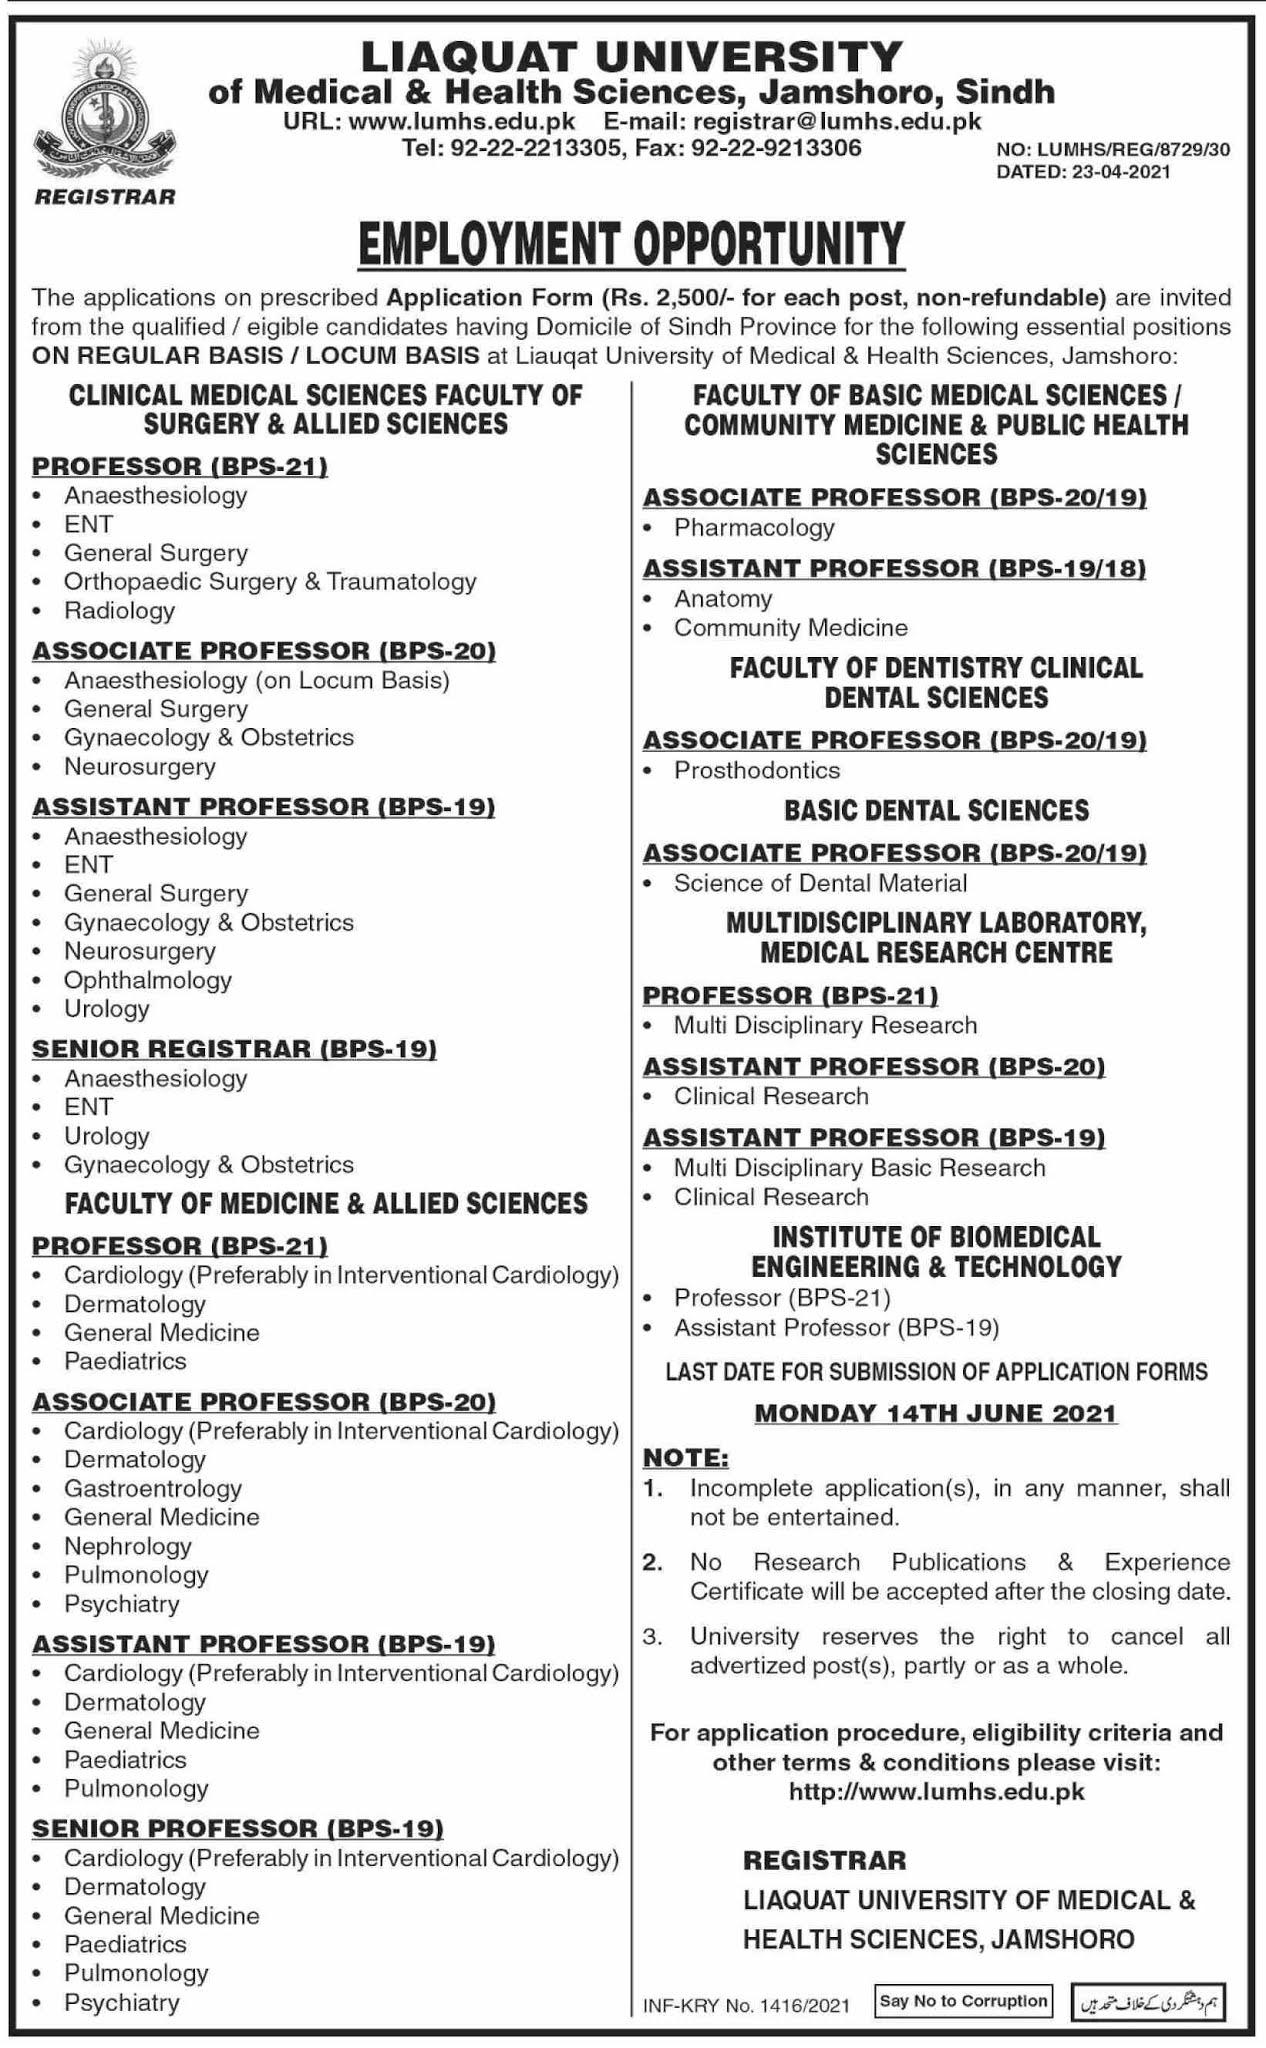 Liaquat University of Medical & Health Sciences (LUMHS) Jobs 2021 in Pakistan